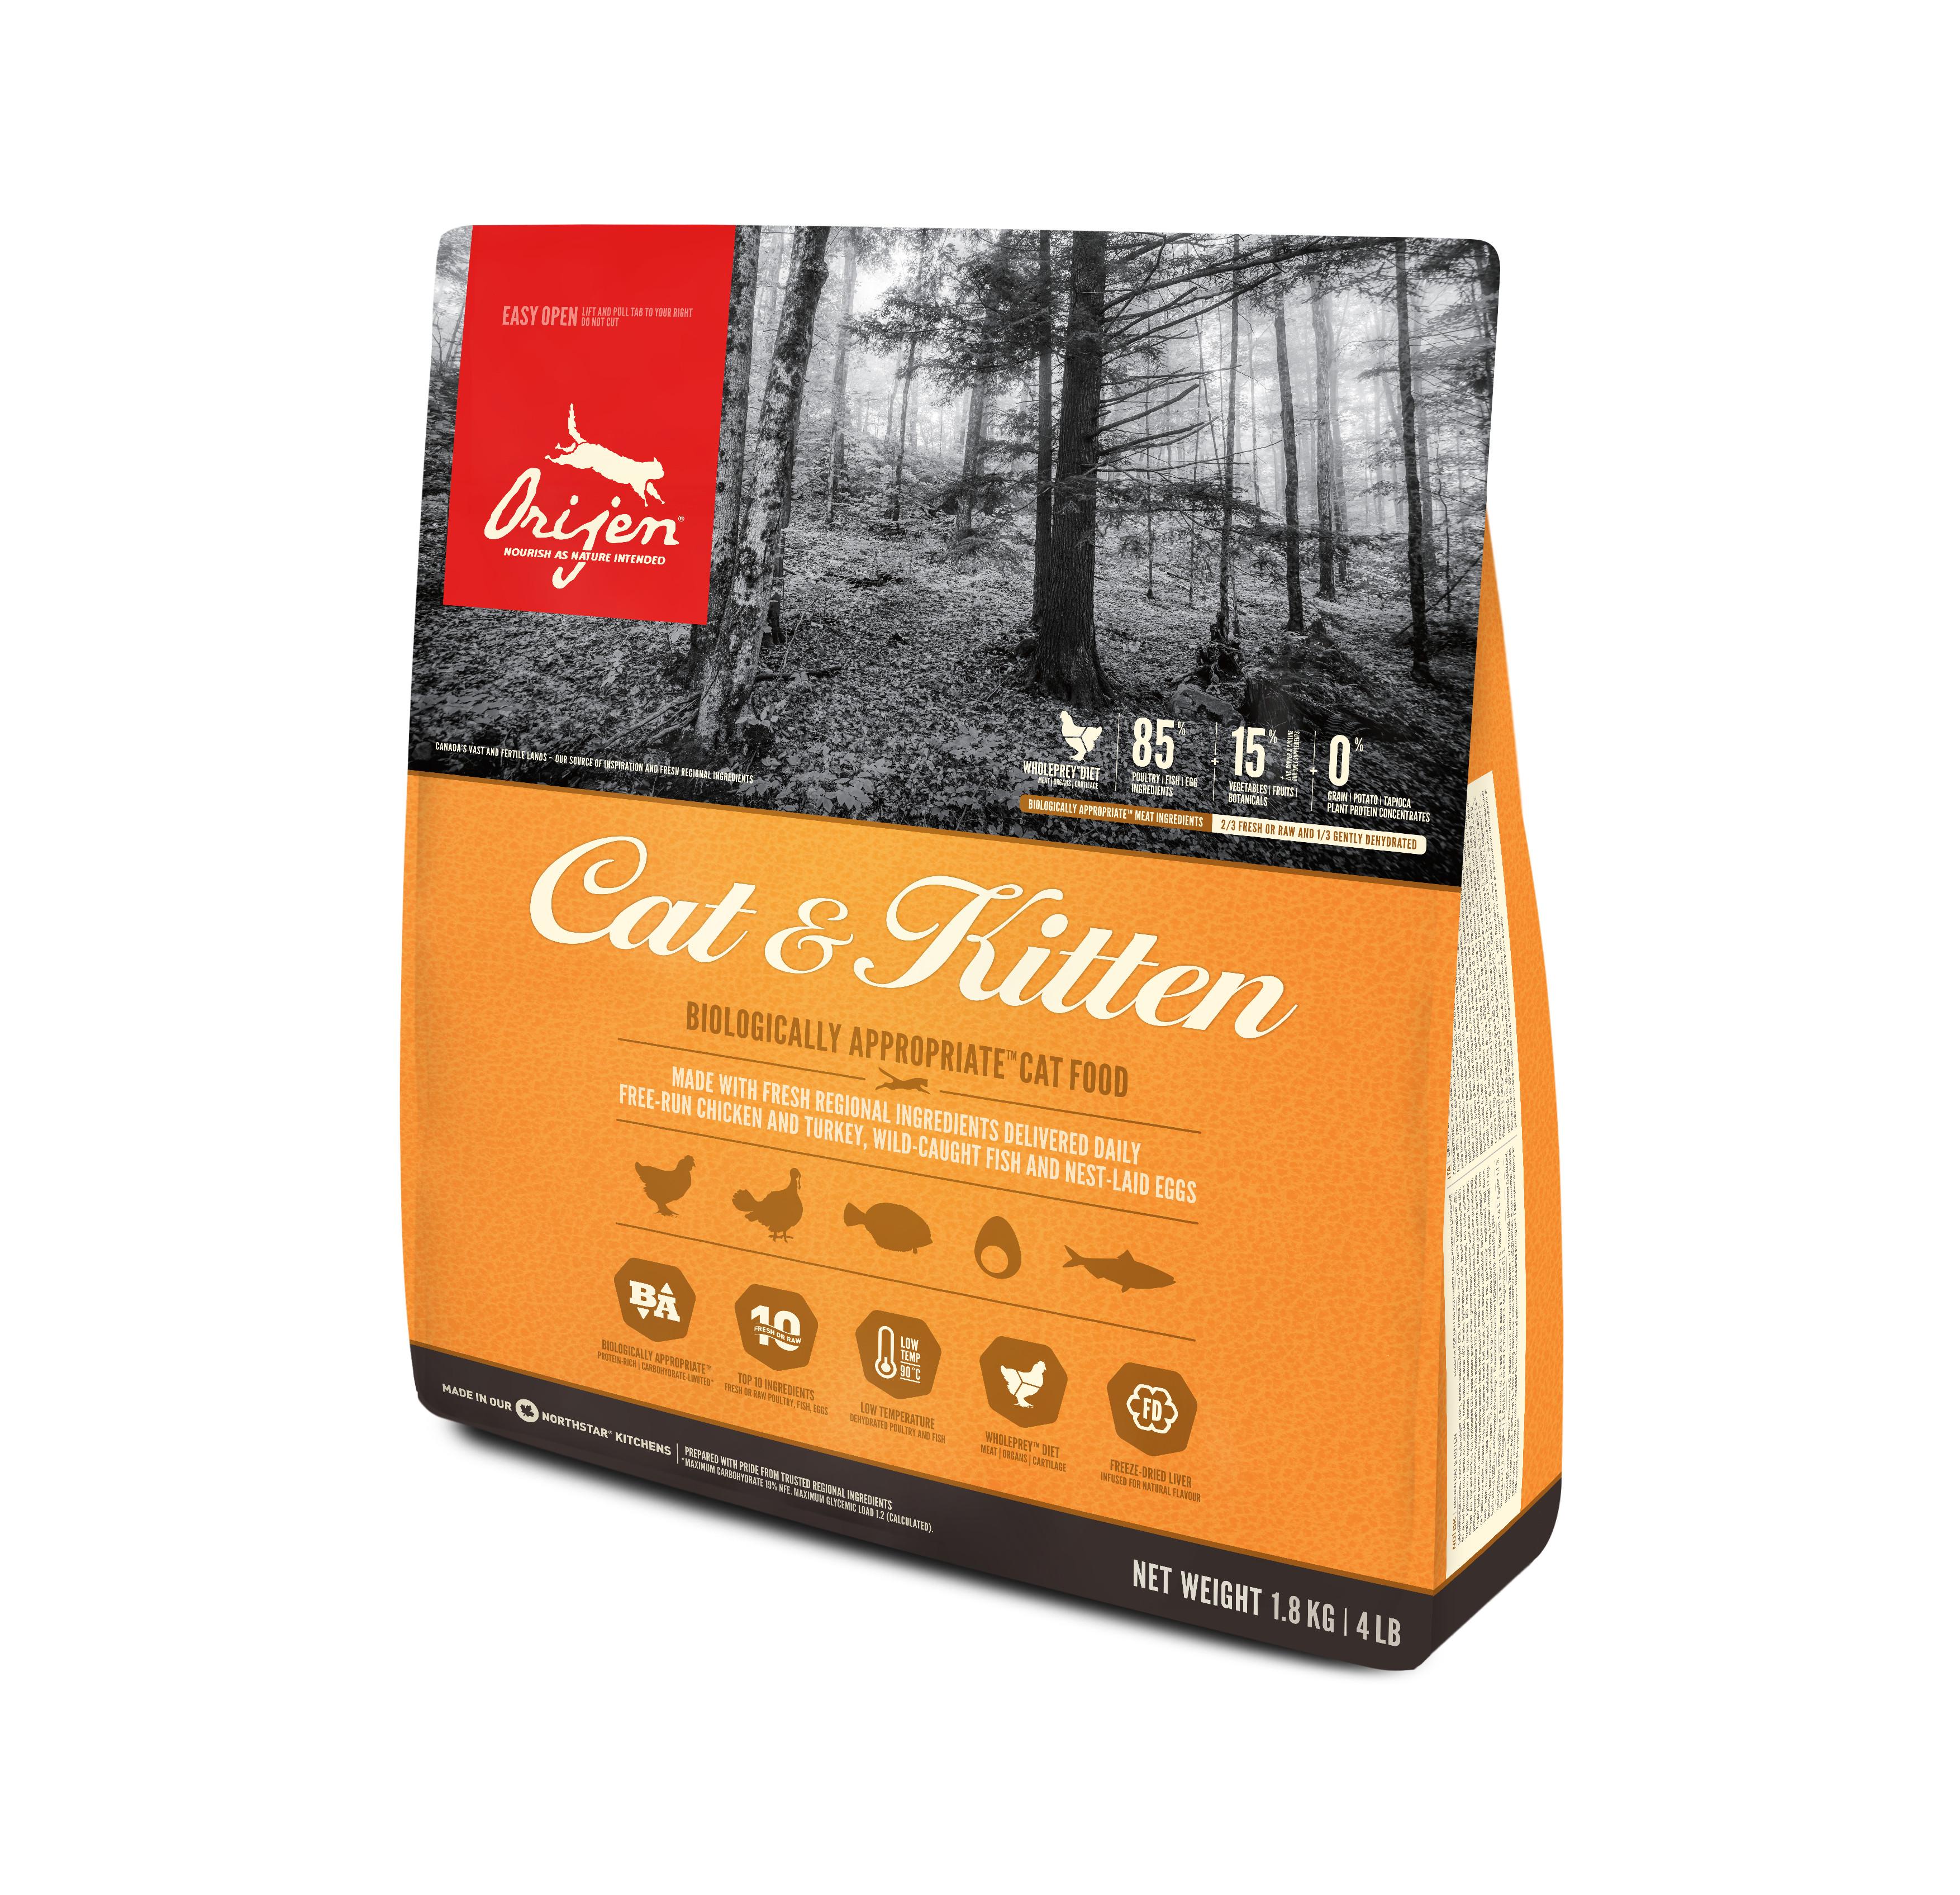 Cat & Kitten - 1,8 kg